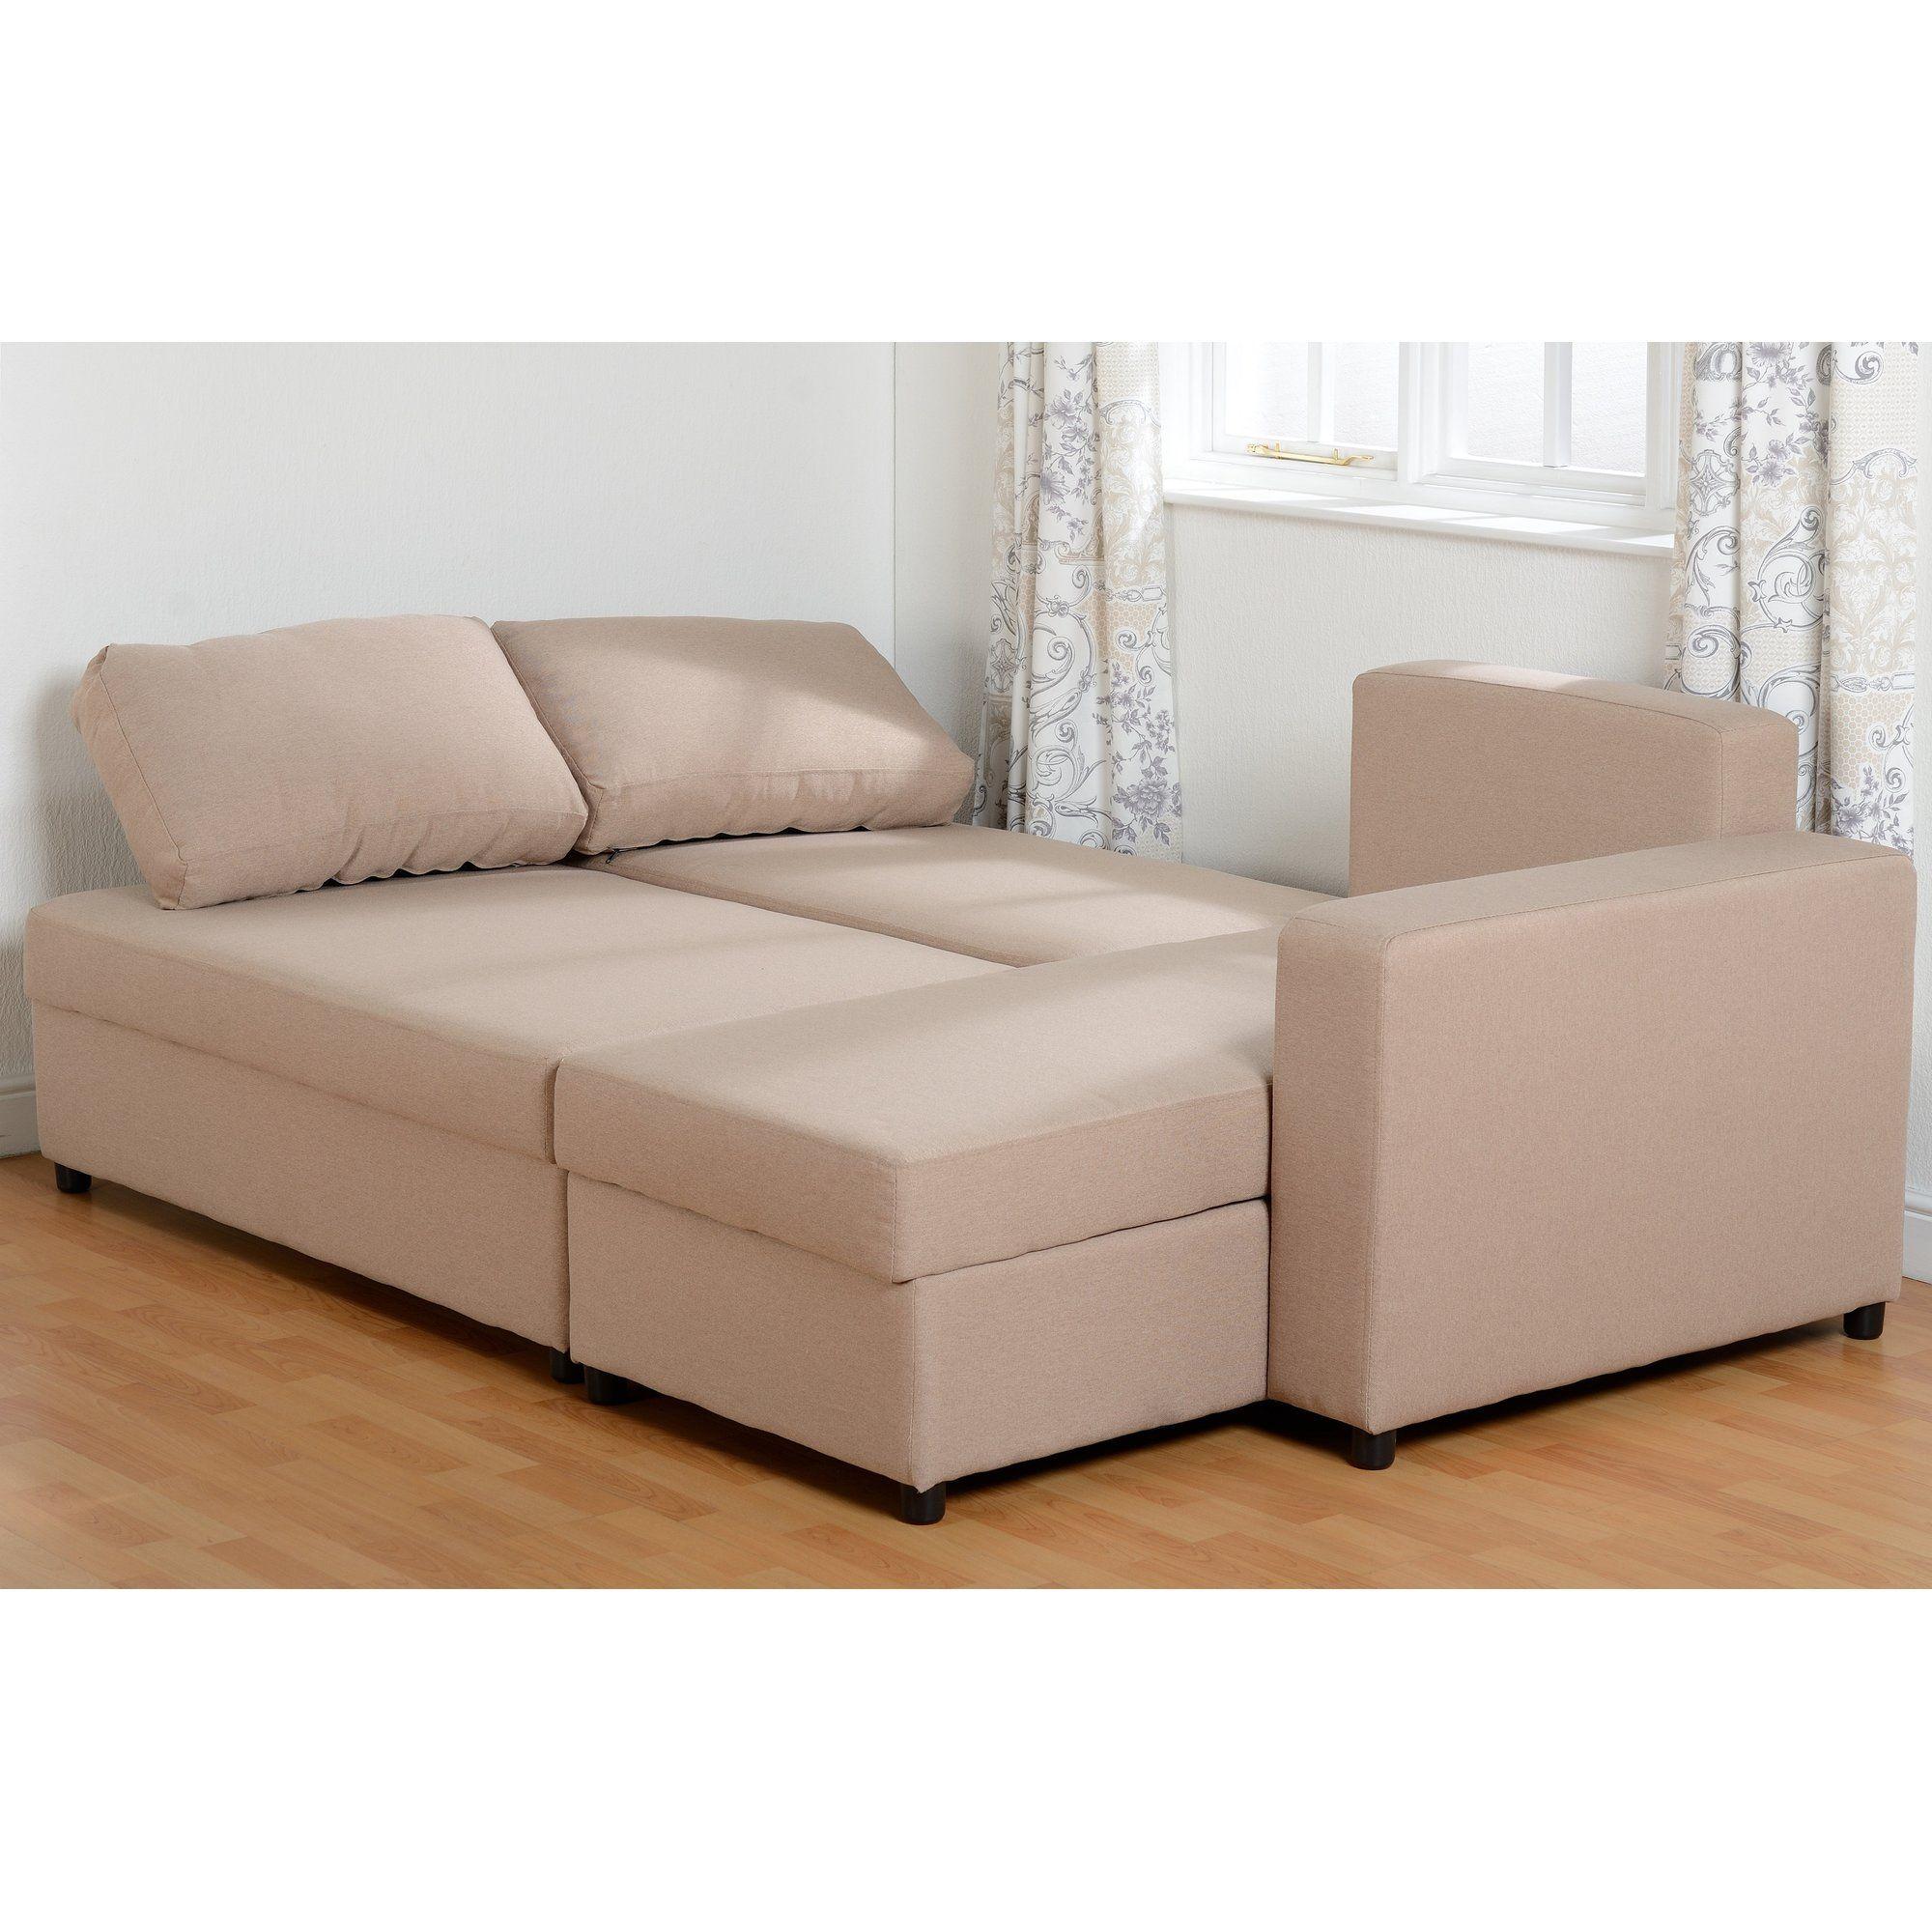 Amal Corner Sofa Bed | House | Sofa, Corner sofa, Sofa bed